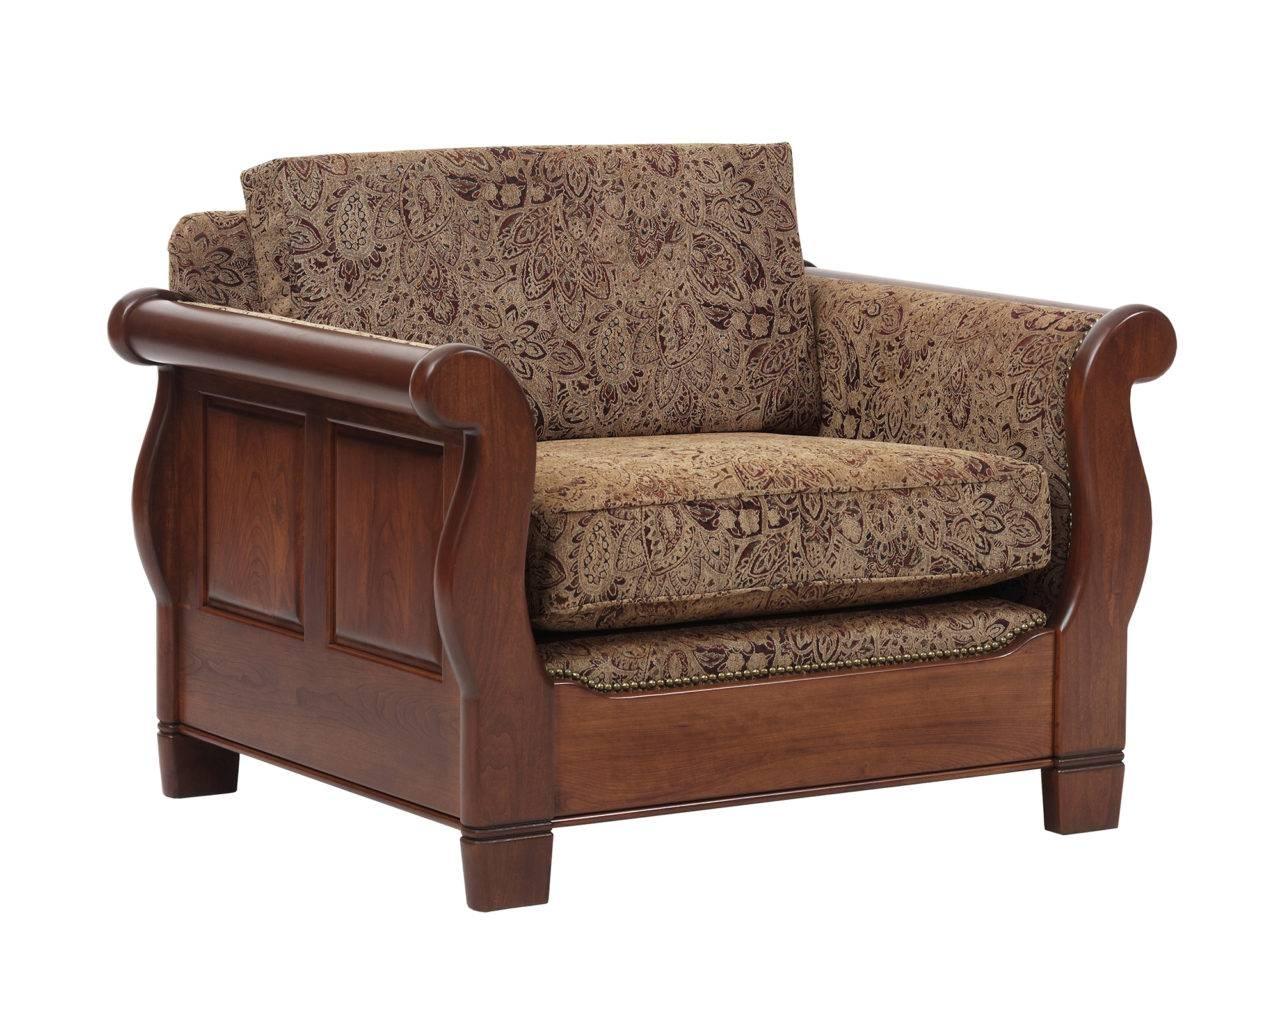 Sleigh Sofa Chair With Single Back Cushion - Gish's Amish Legacies with Sofa Chairs (Image 25 of 30)